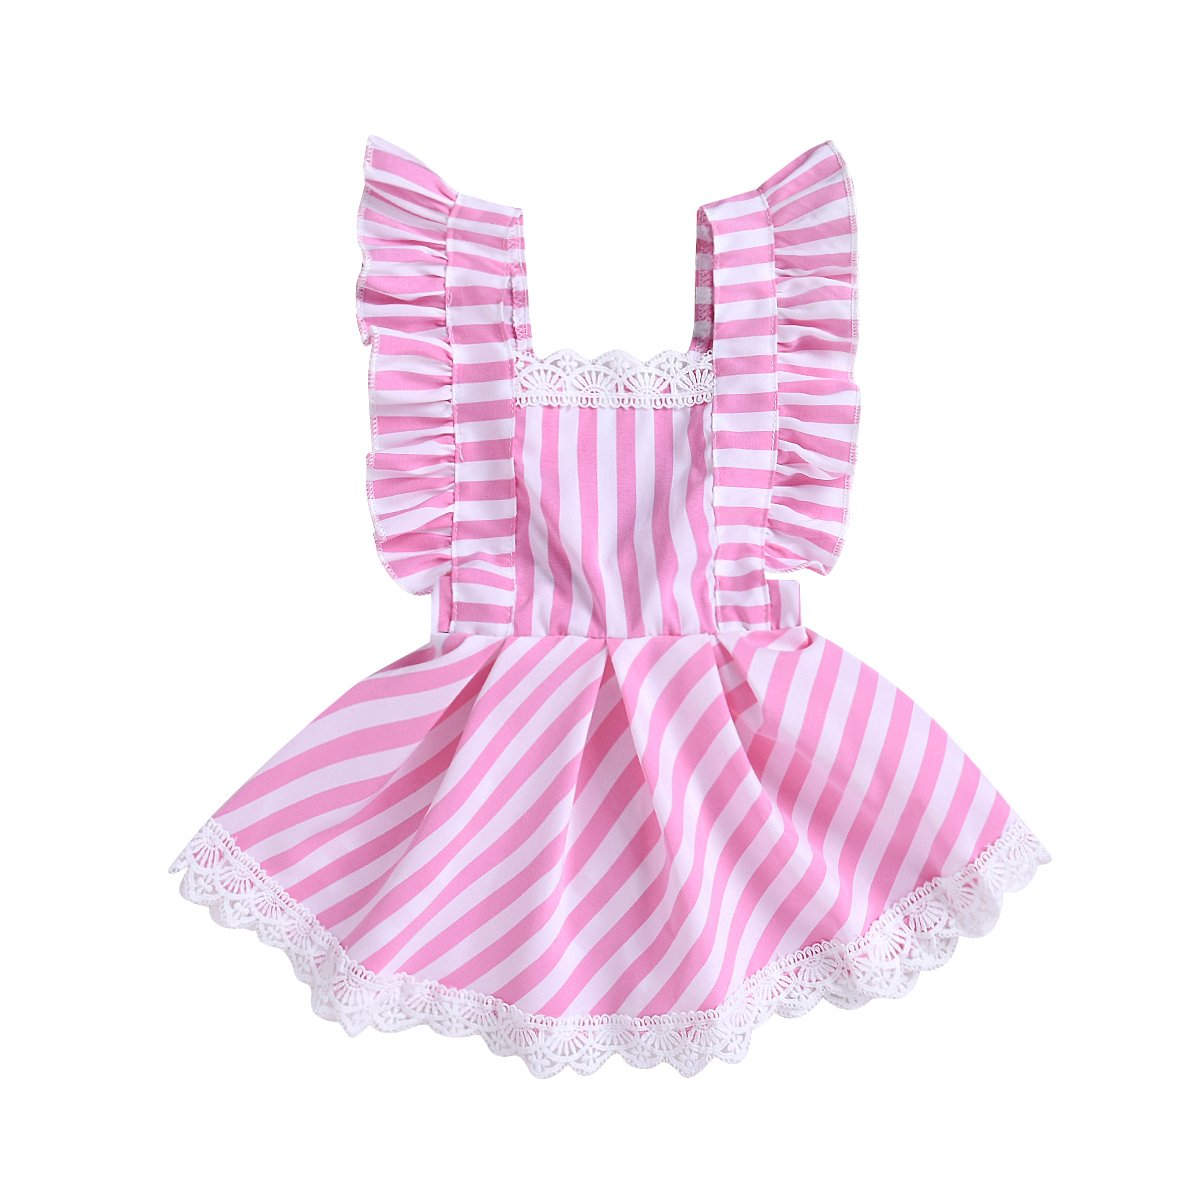 Gerber Baby Girl 3-Piece NFL Houston Texans Navy//Pink Onesies Size 0-3M